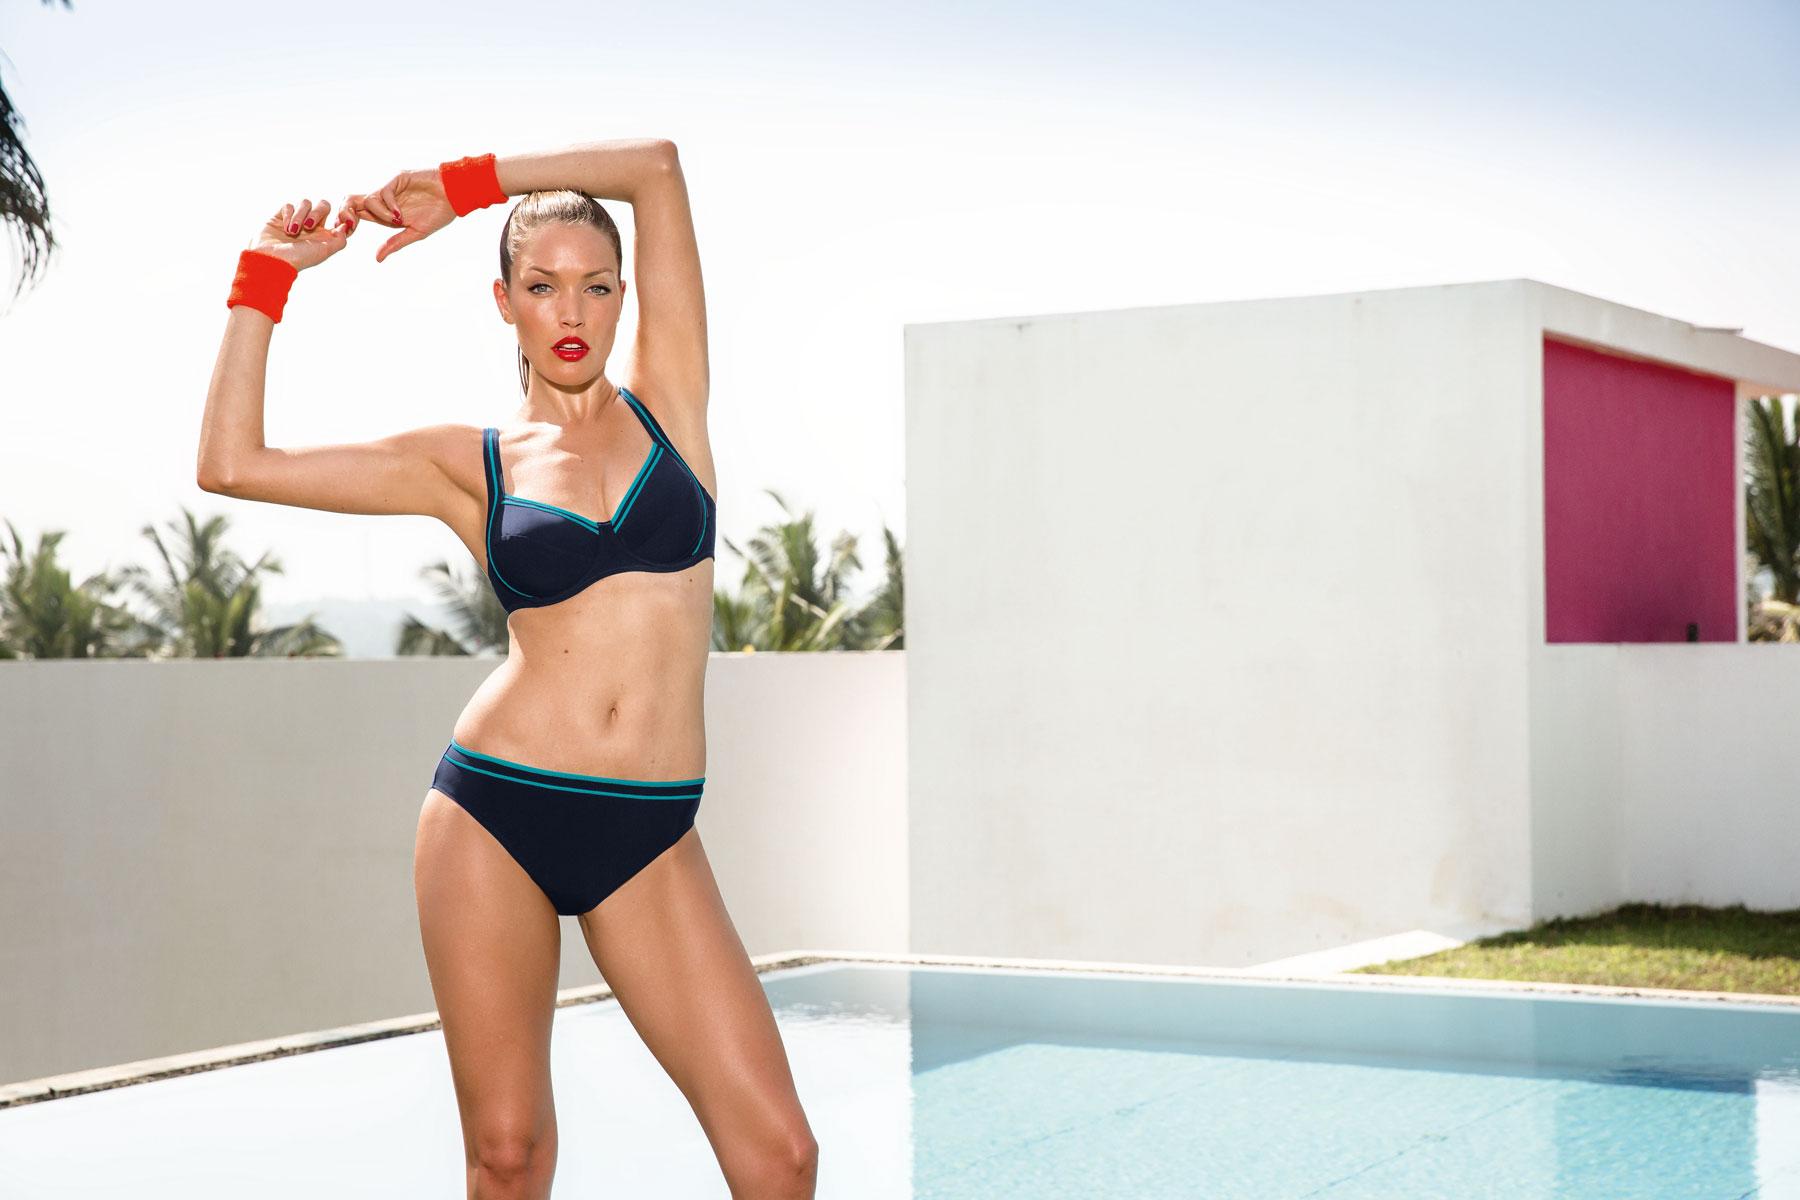 Frau am Pool im Bikini